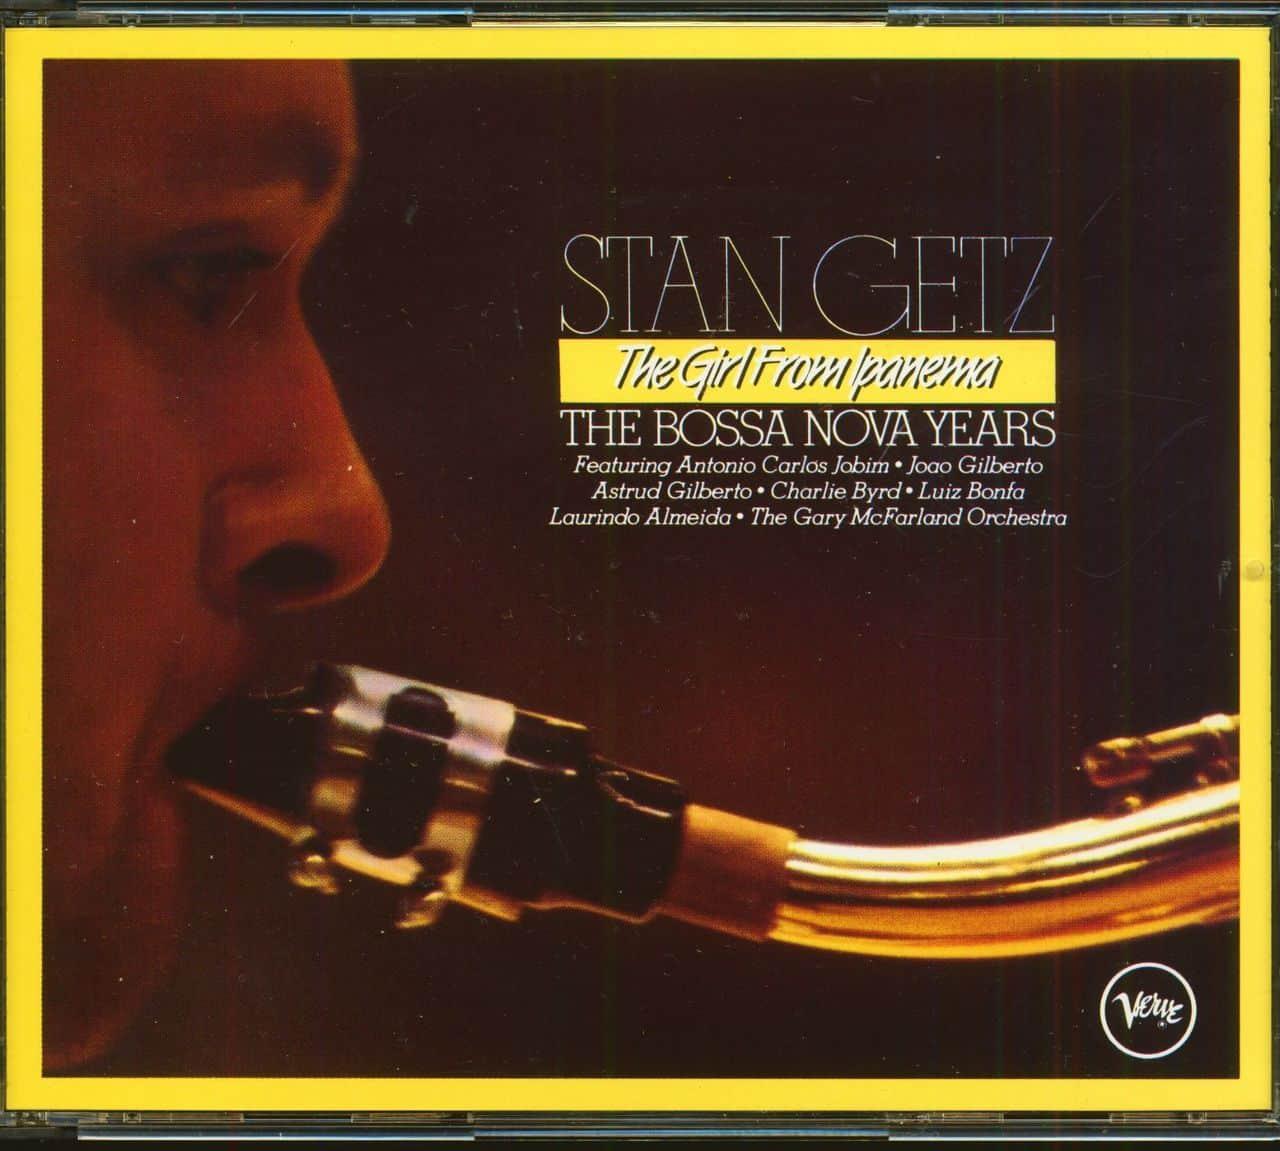 The Girl From Ipanema - Stan Getz - The Bossa Nova Album